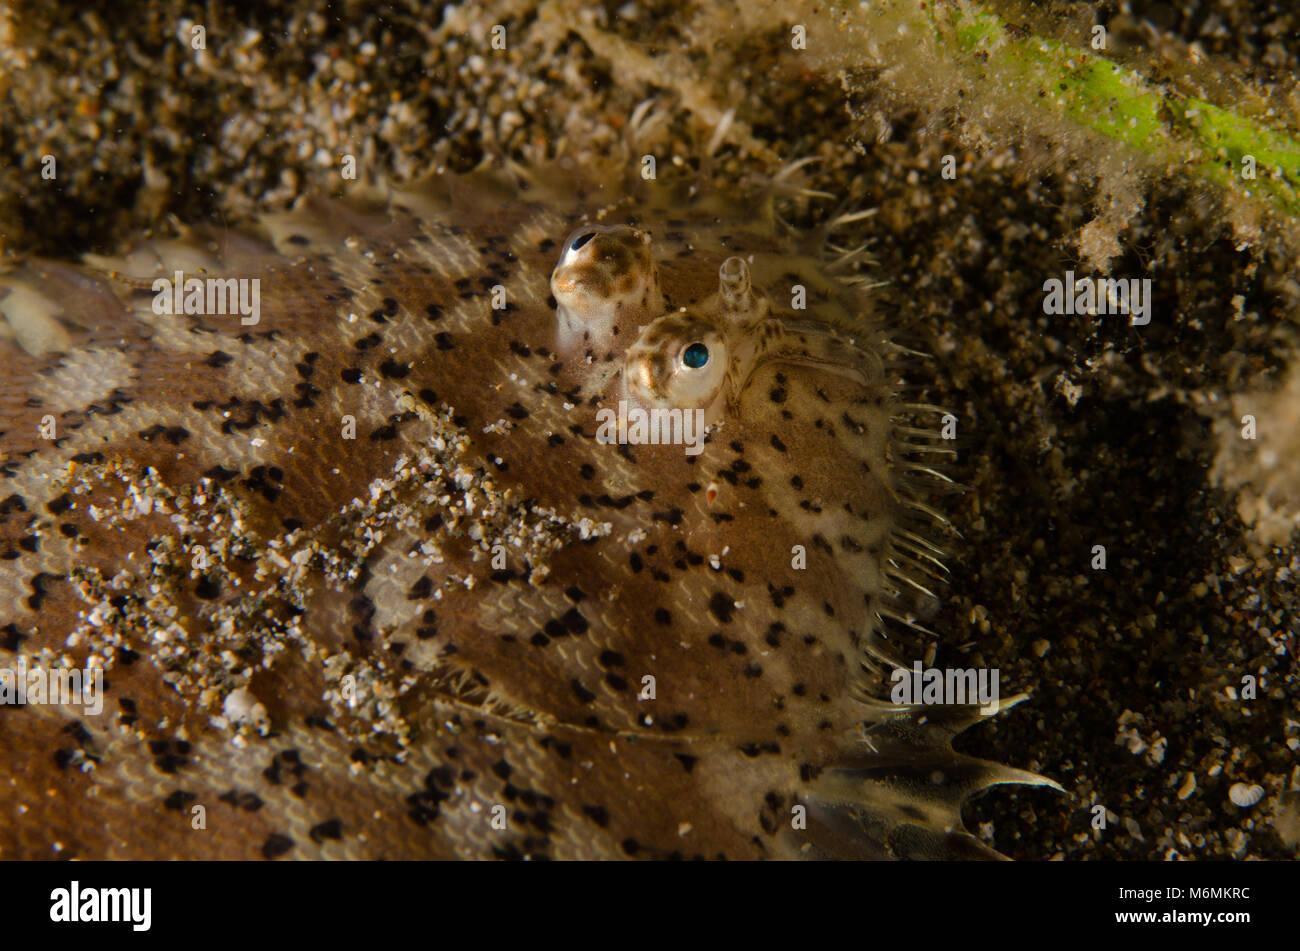 Suola Blackspotted, chiazzato suola, Aseraggodes melanostictus, Soleidi, Anilao, Filippine, Asia Immagini Stock